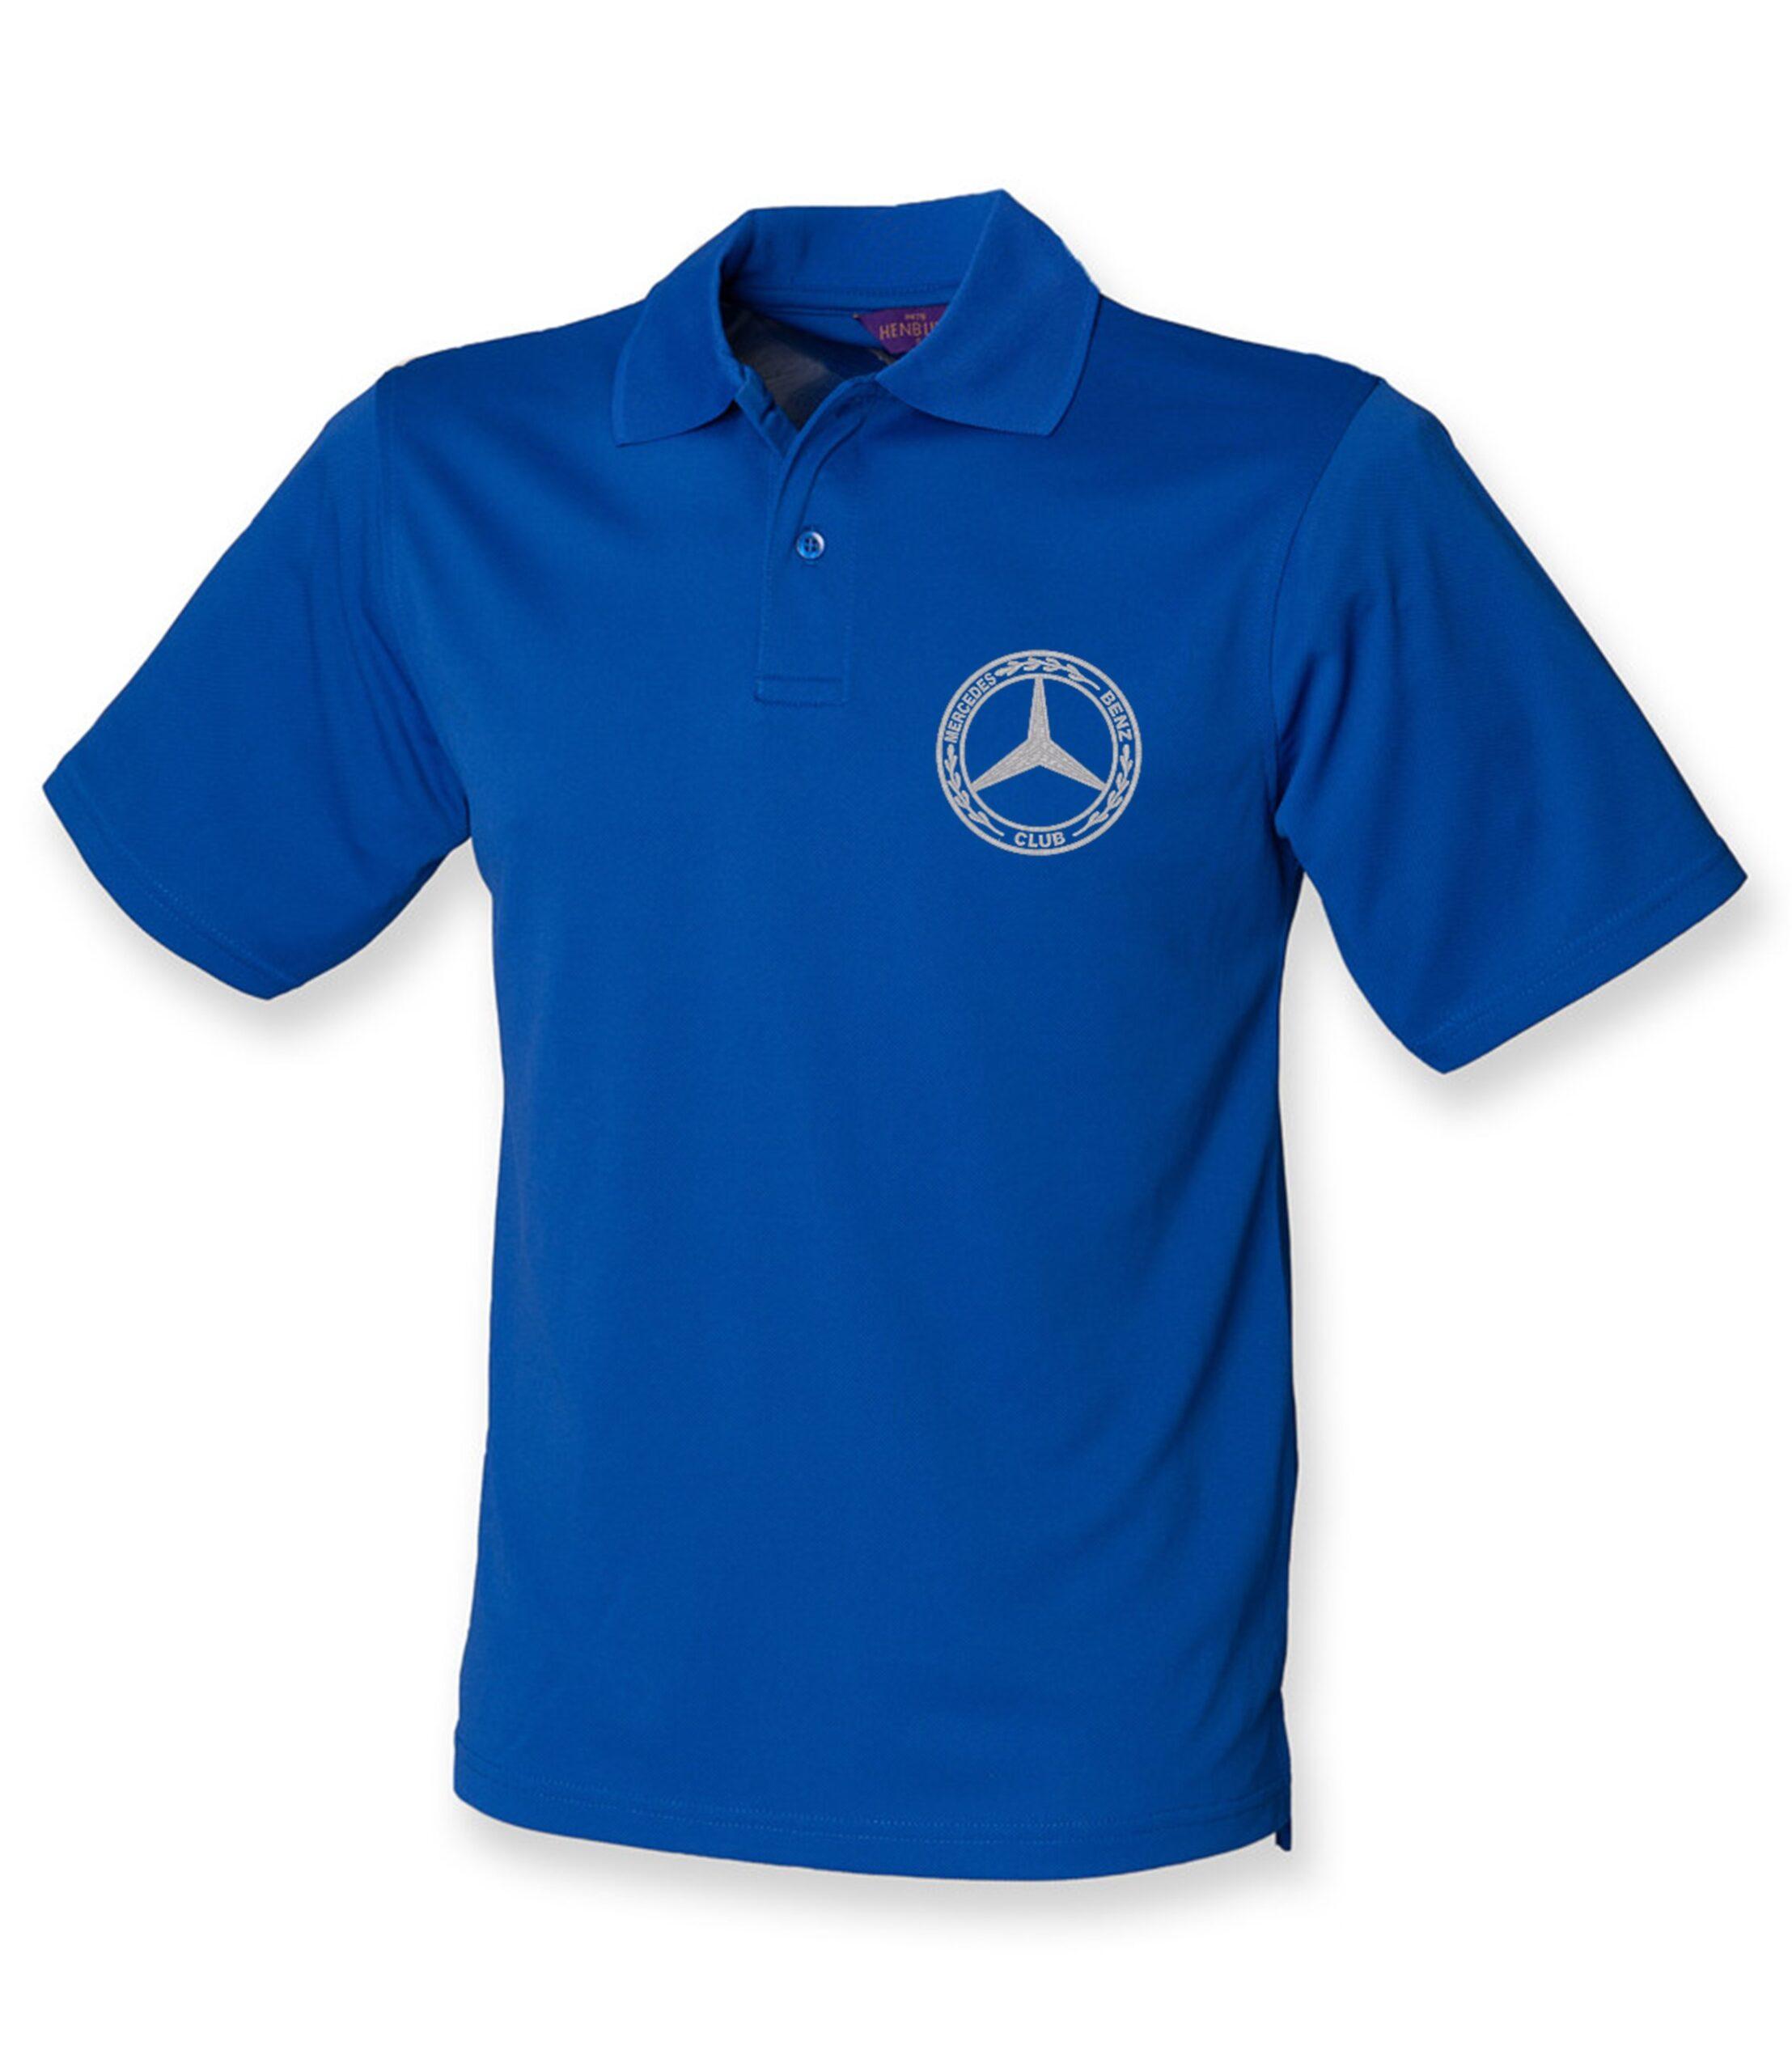 Mercedes-Benz Club Wicking Pique Polo Shirt Royal Blue